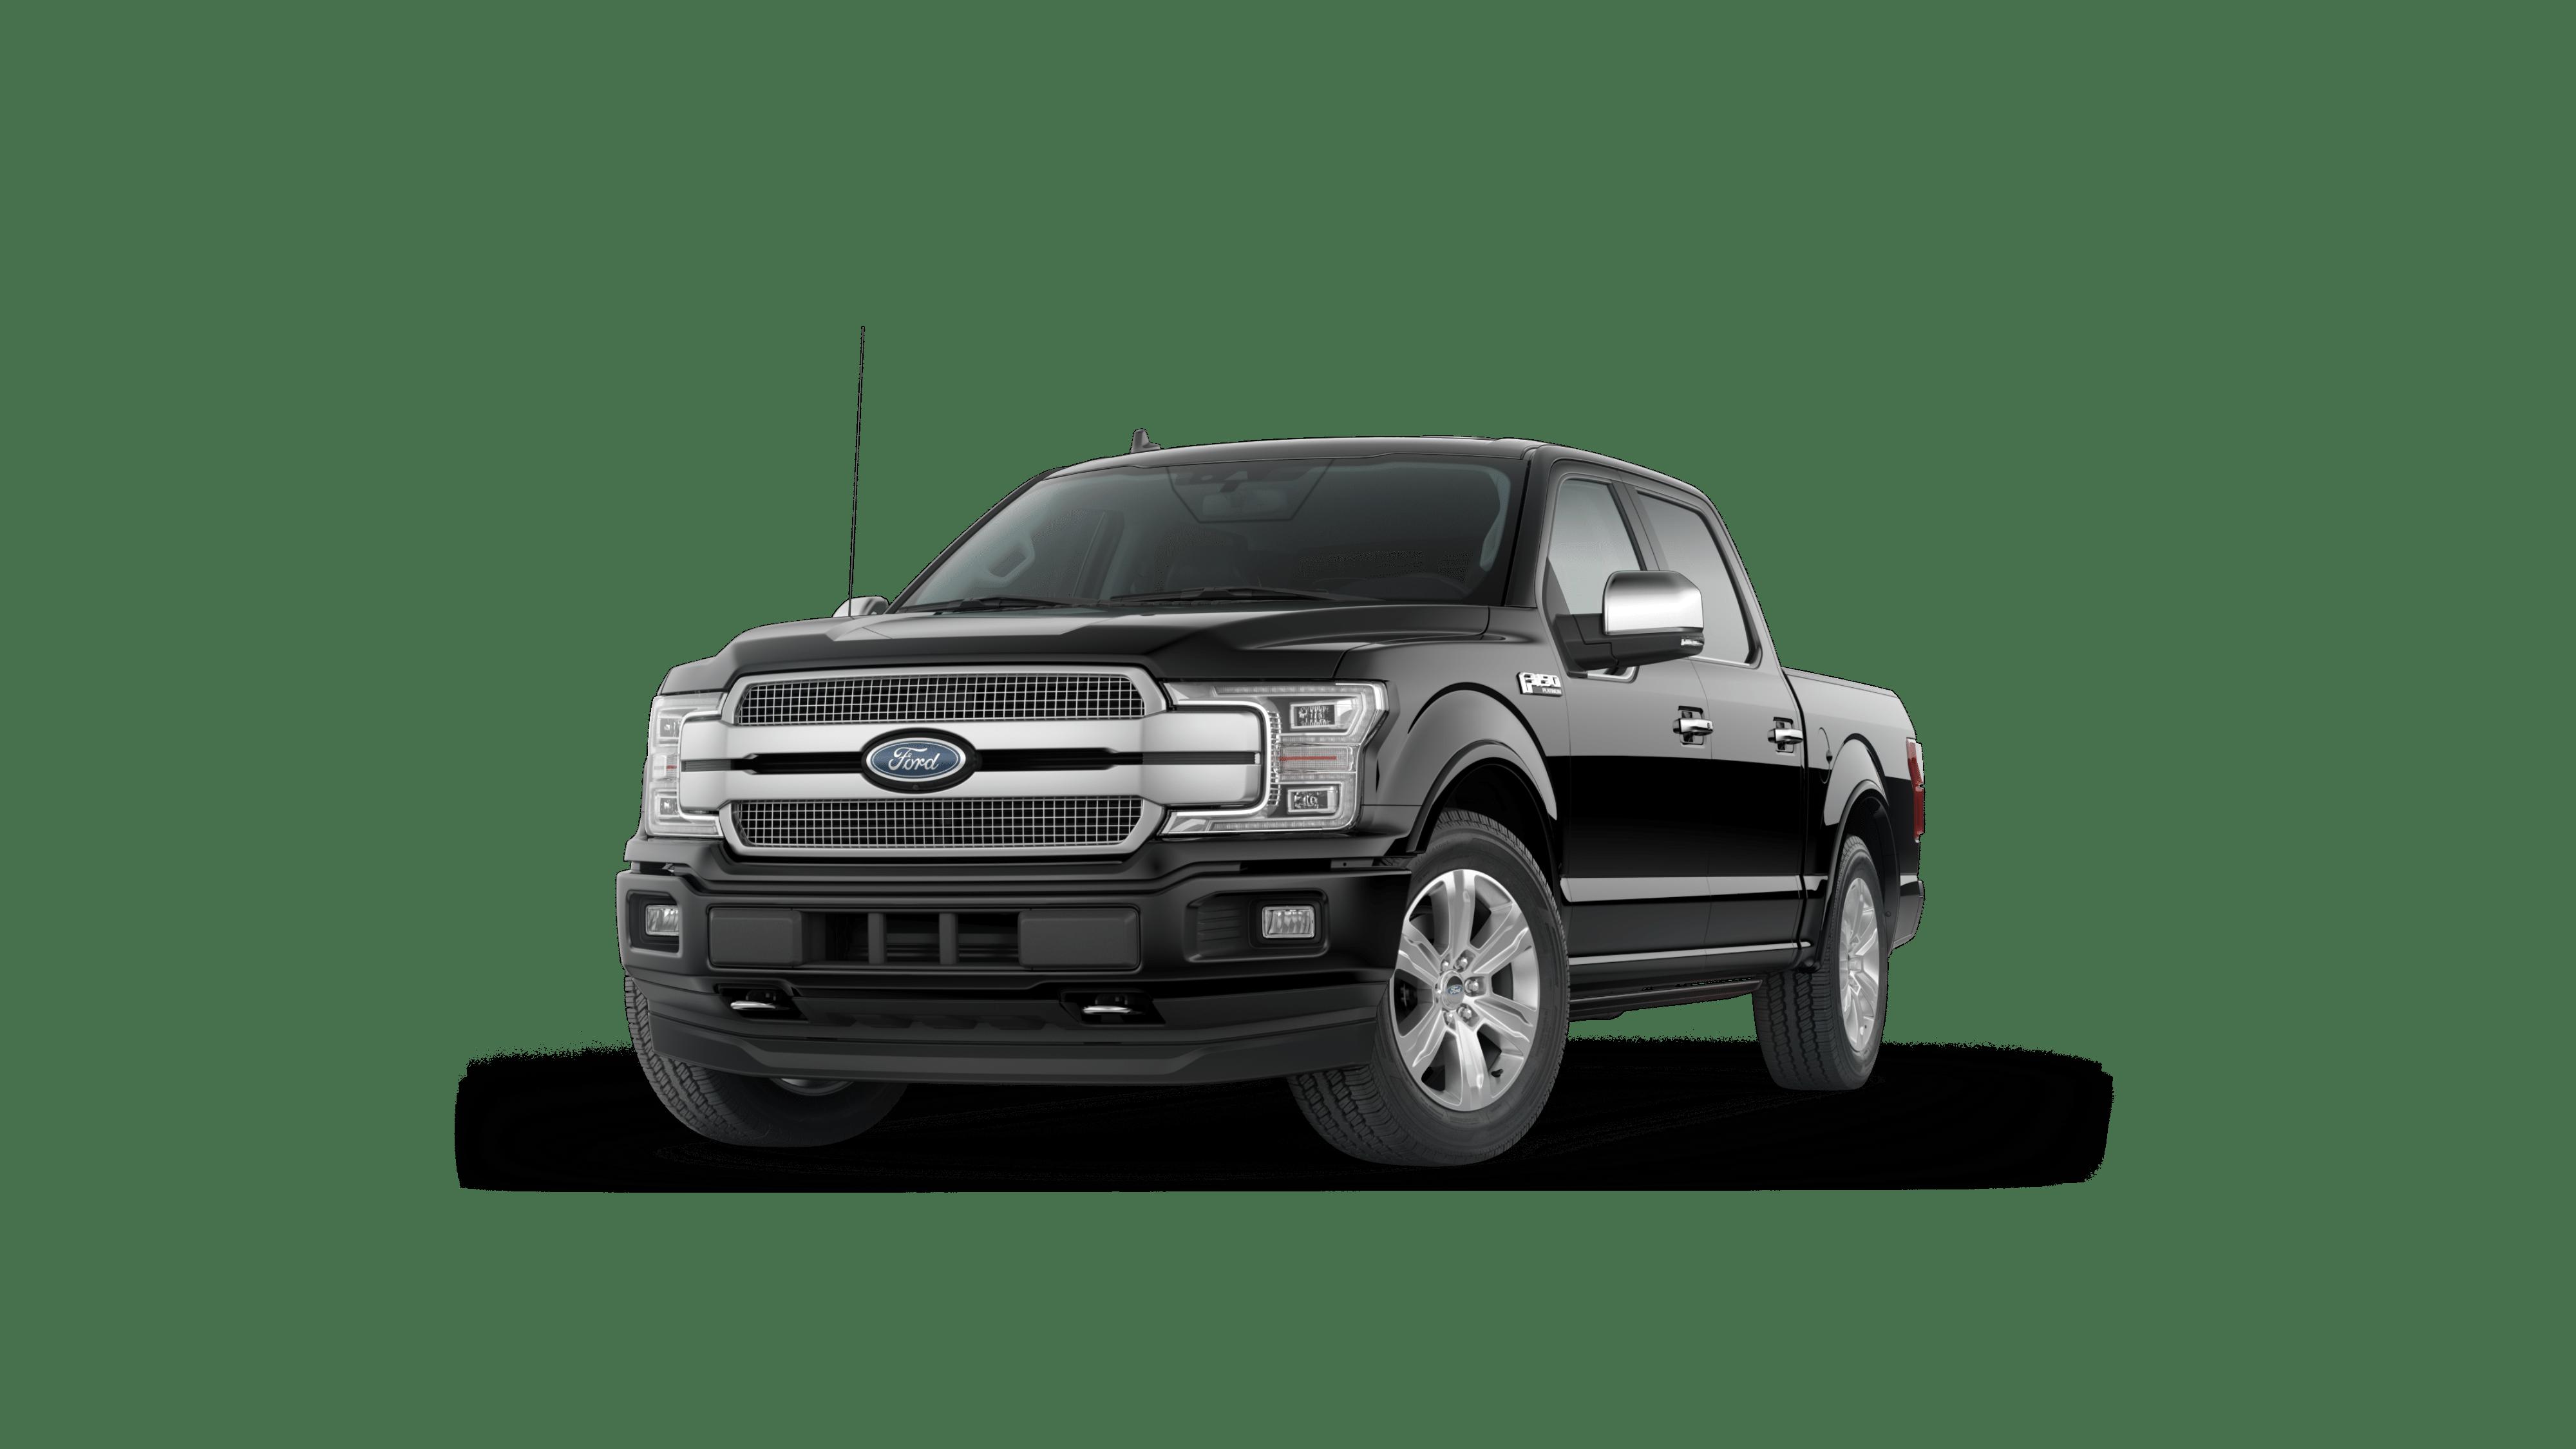 freehold htm in escape dealership ford dealers comparison new nj